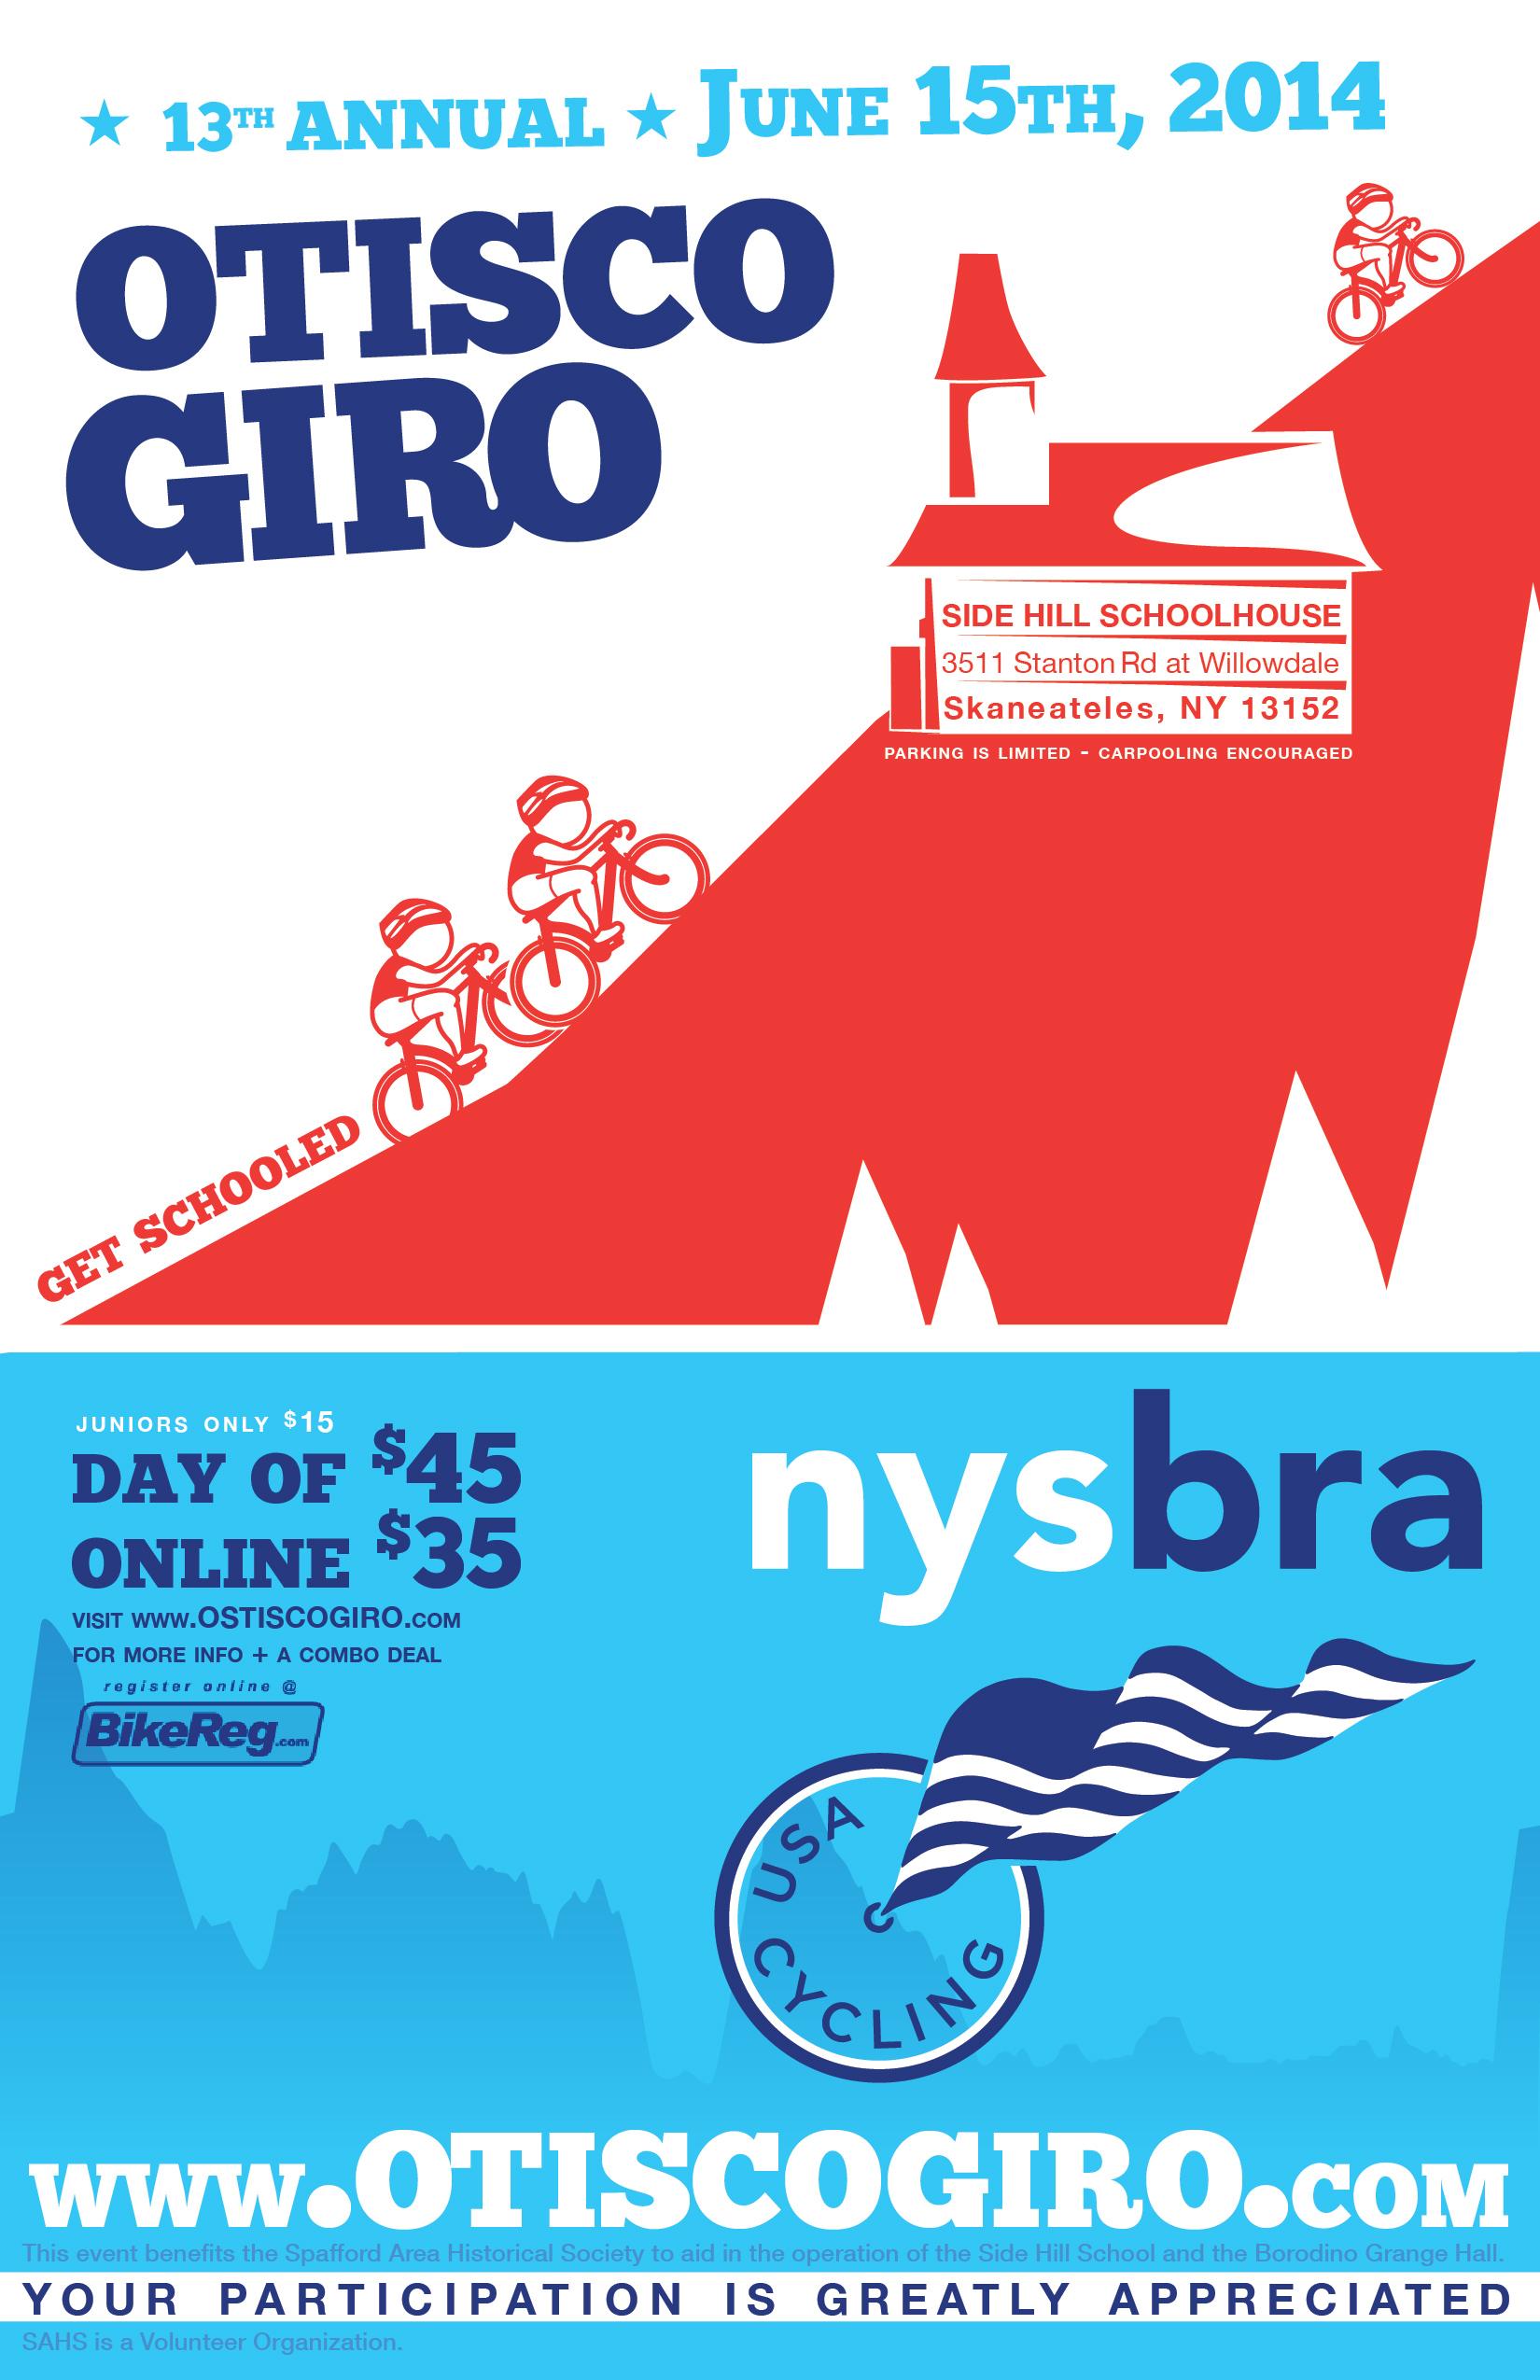 2014 Otisco Giro